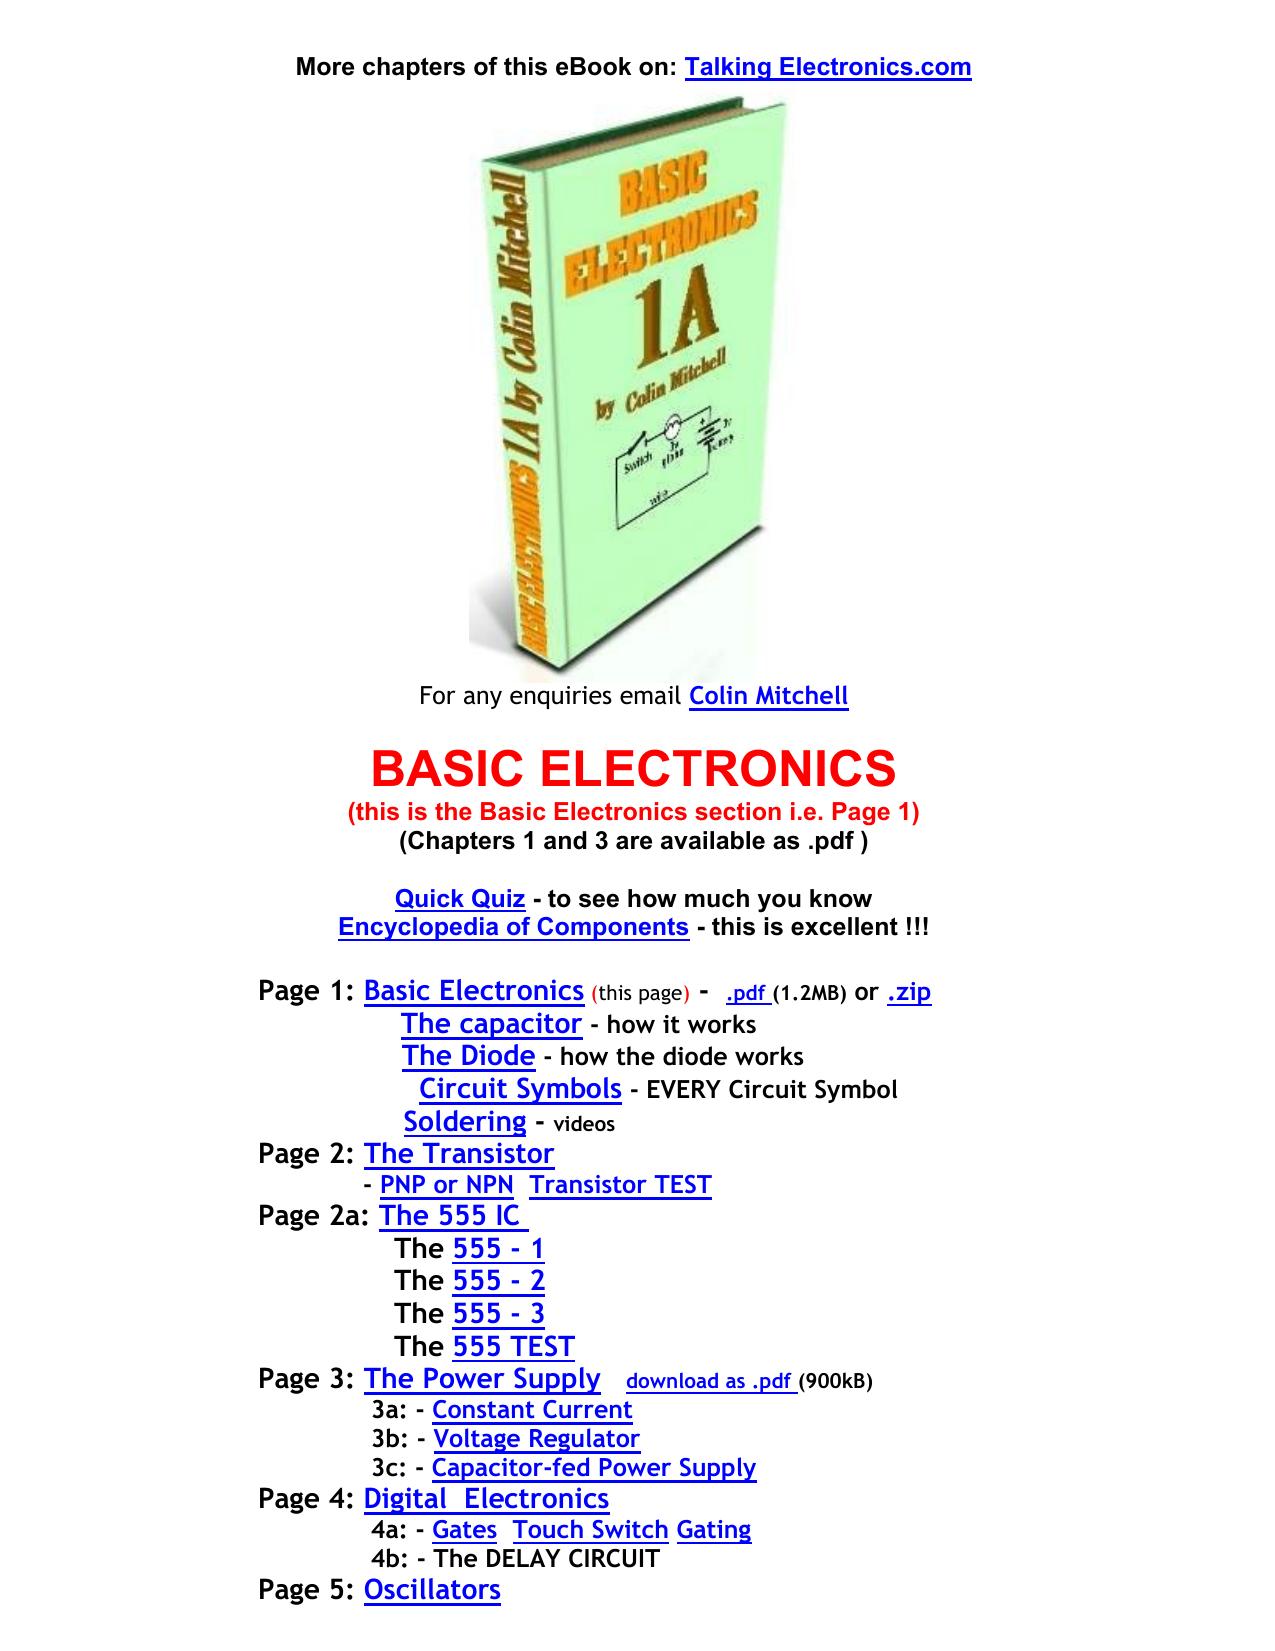 f5b5e3c1efc8b5 basic electronics - Talking Electronics